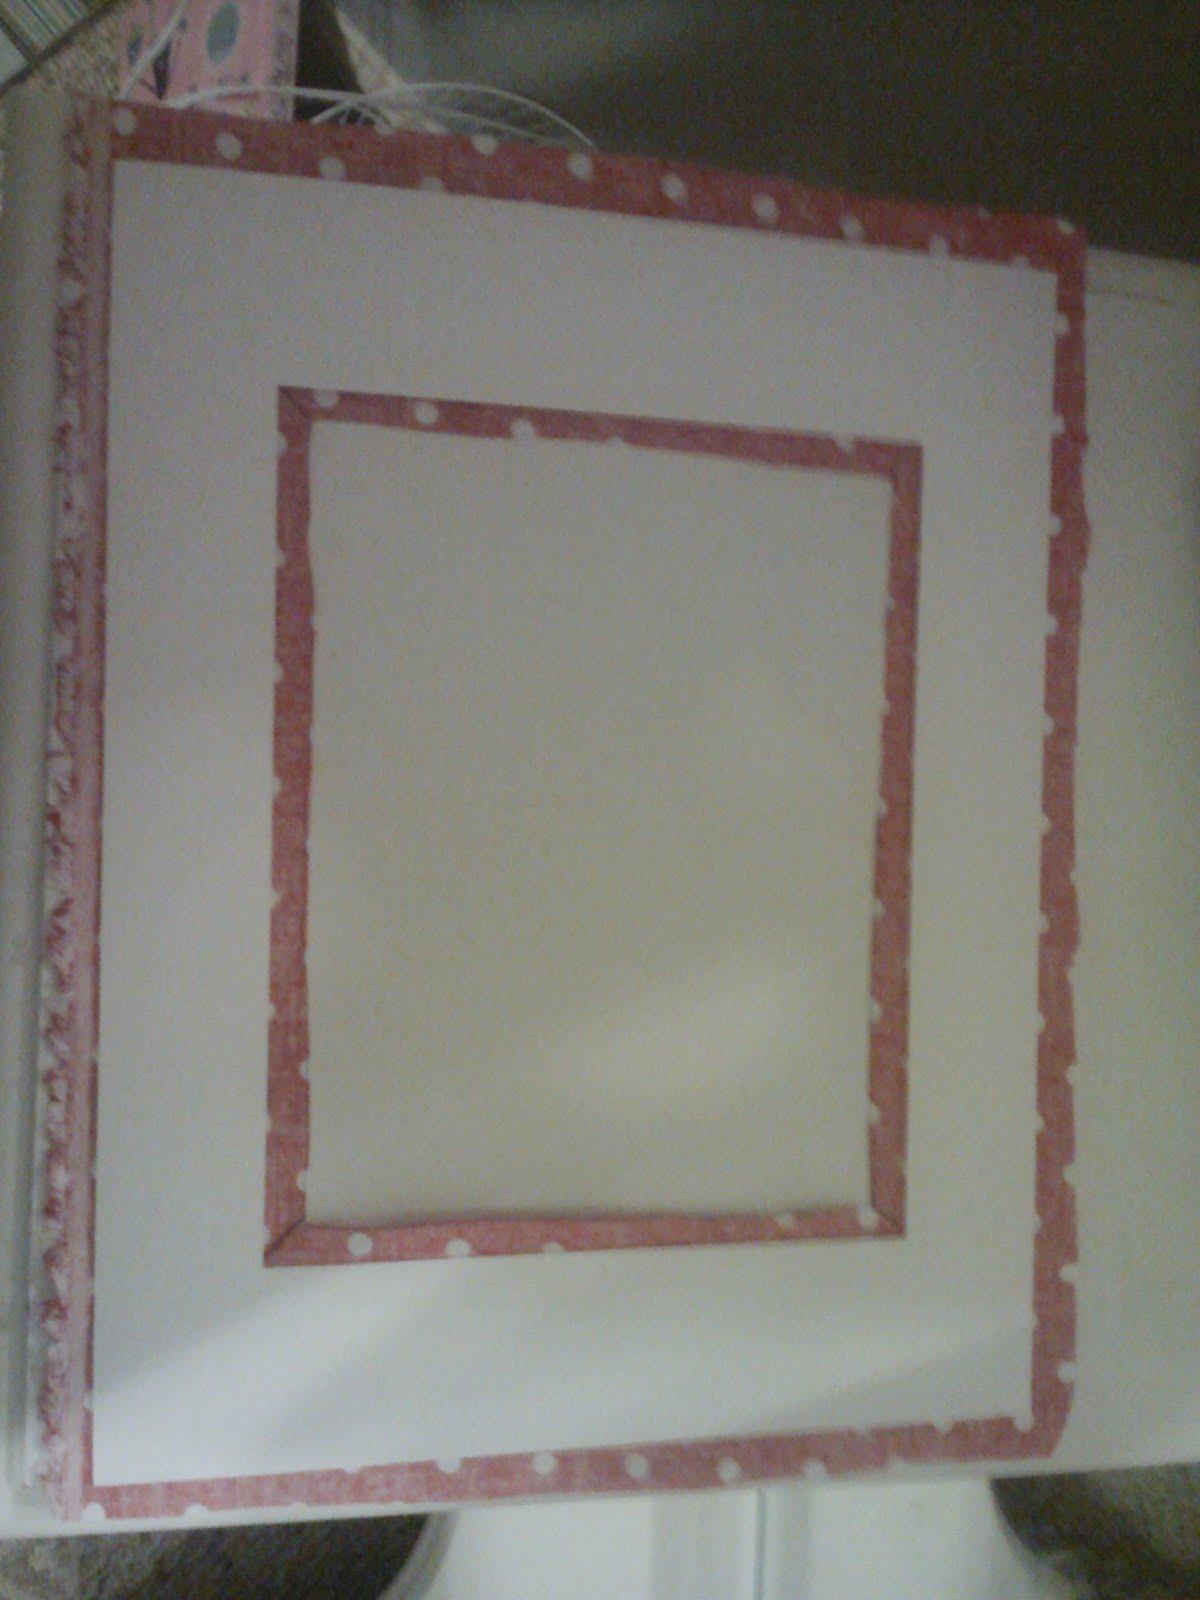 Goat lulu nursery diy week tutorial fabric covered for Diy fabric picture frame